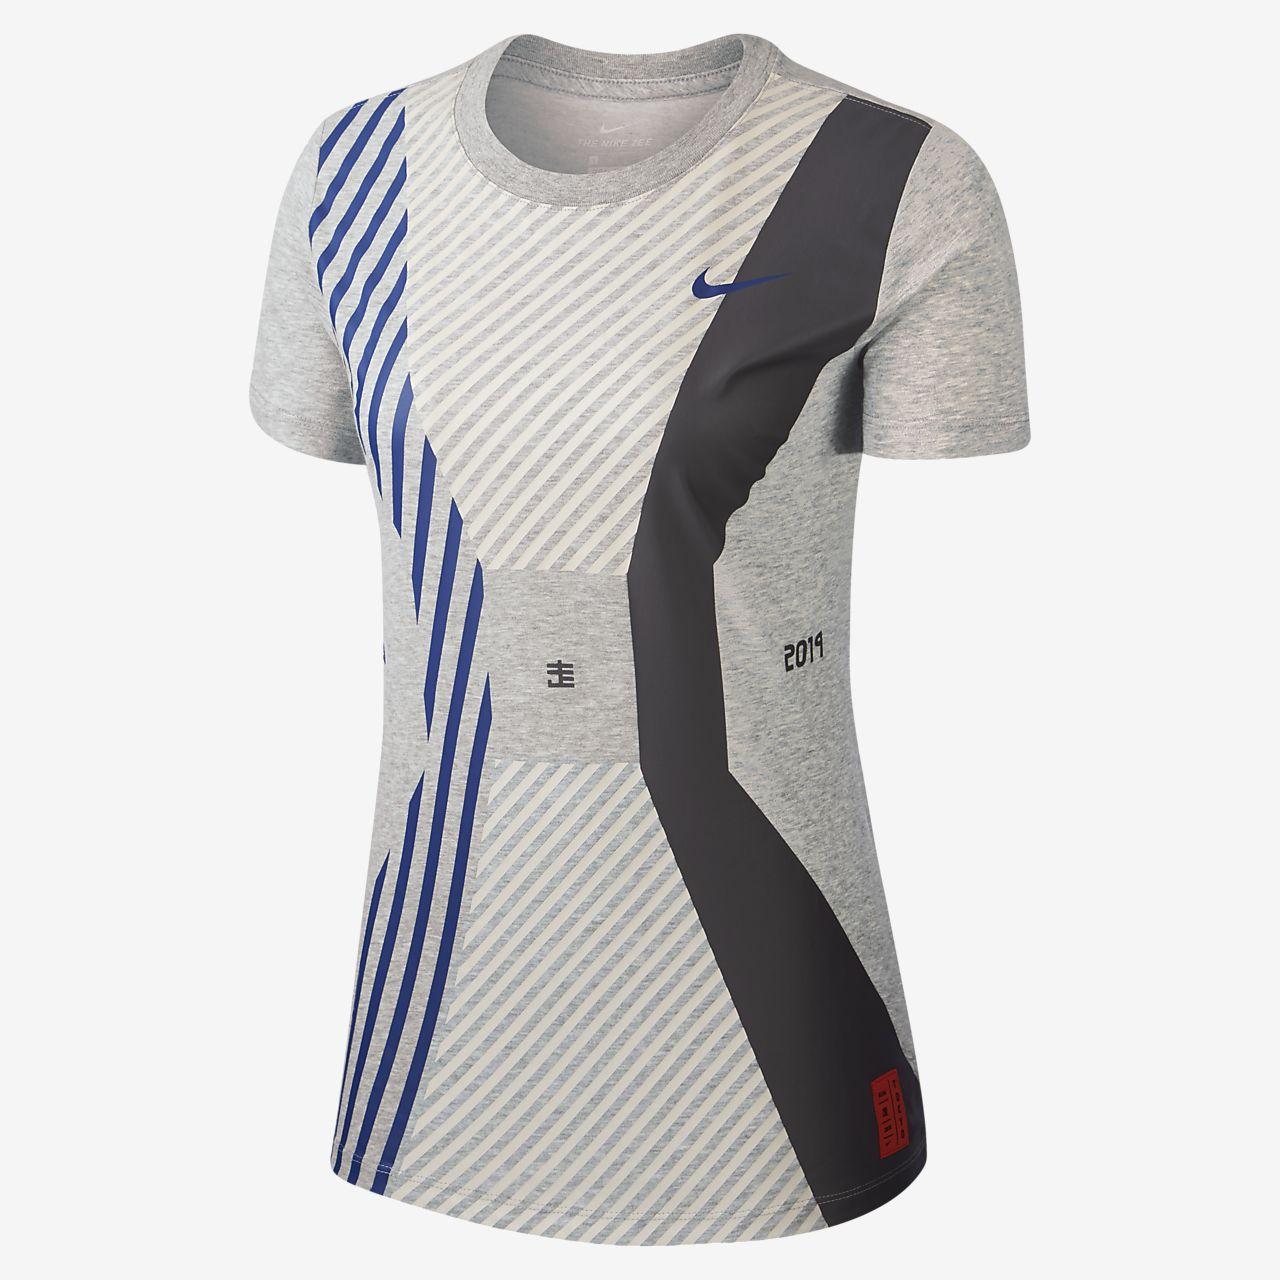 Fit Camiseta Es De Nike Mujer Running Dri 7qwzwgxp